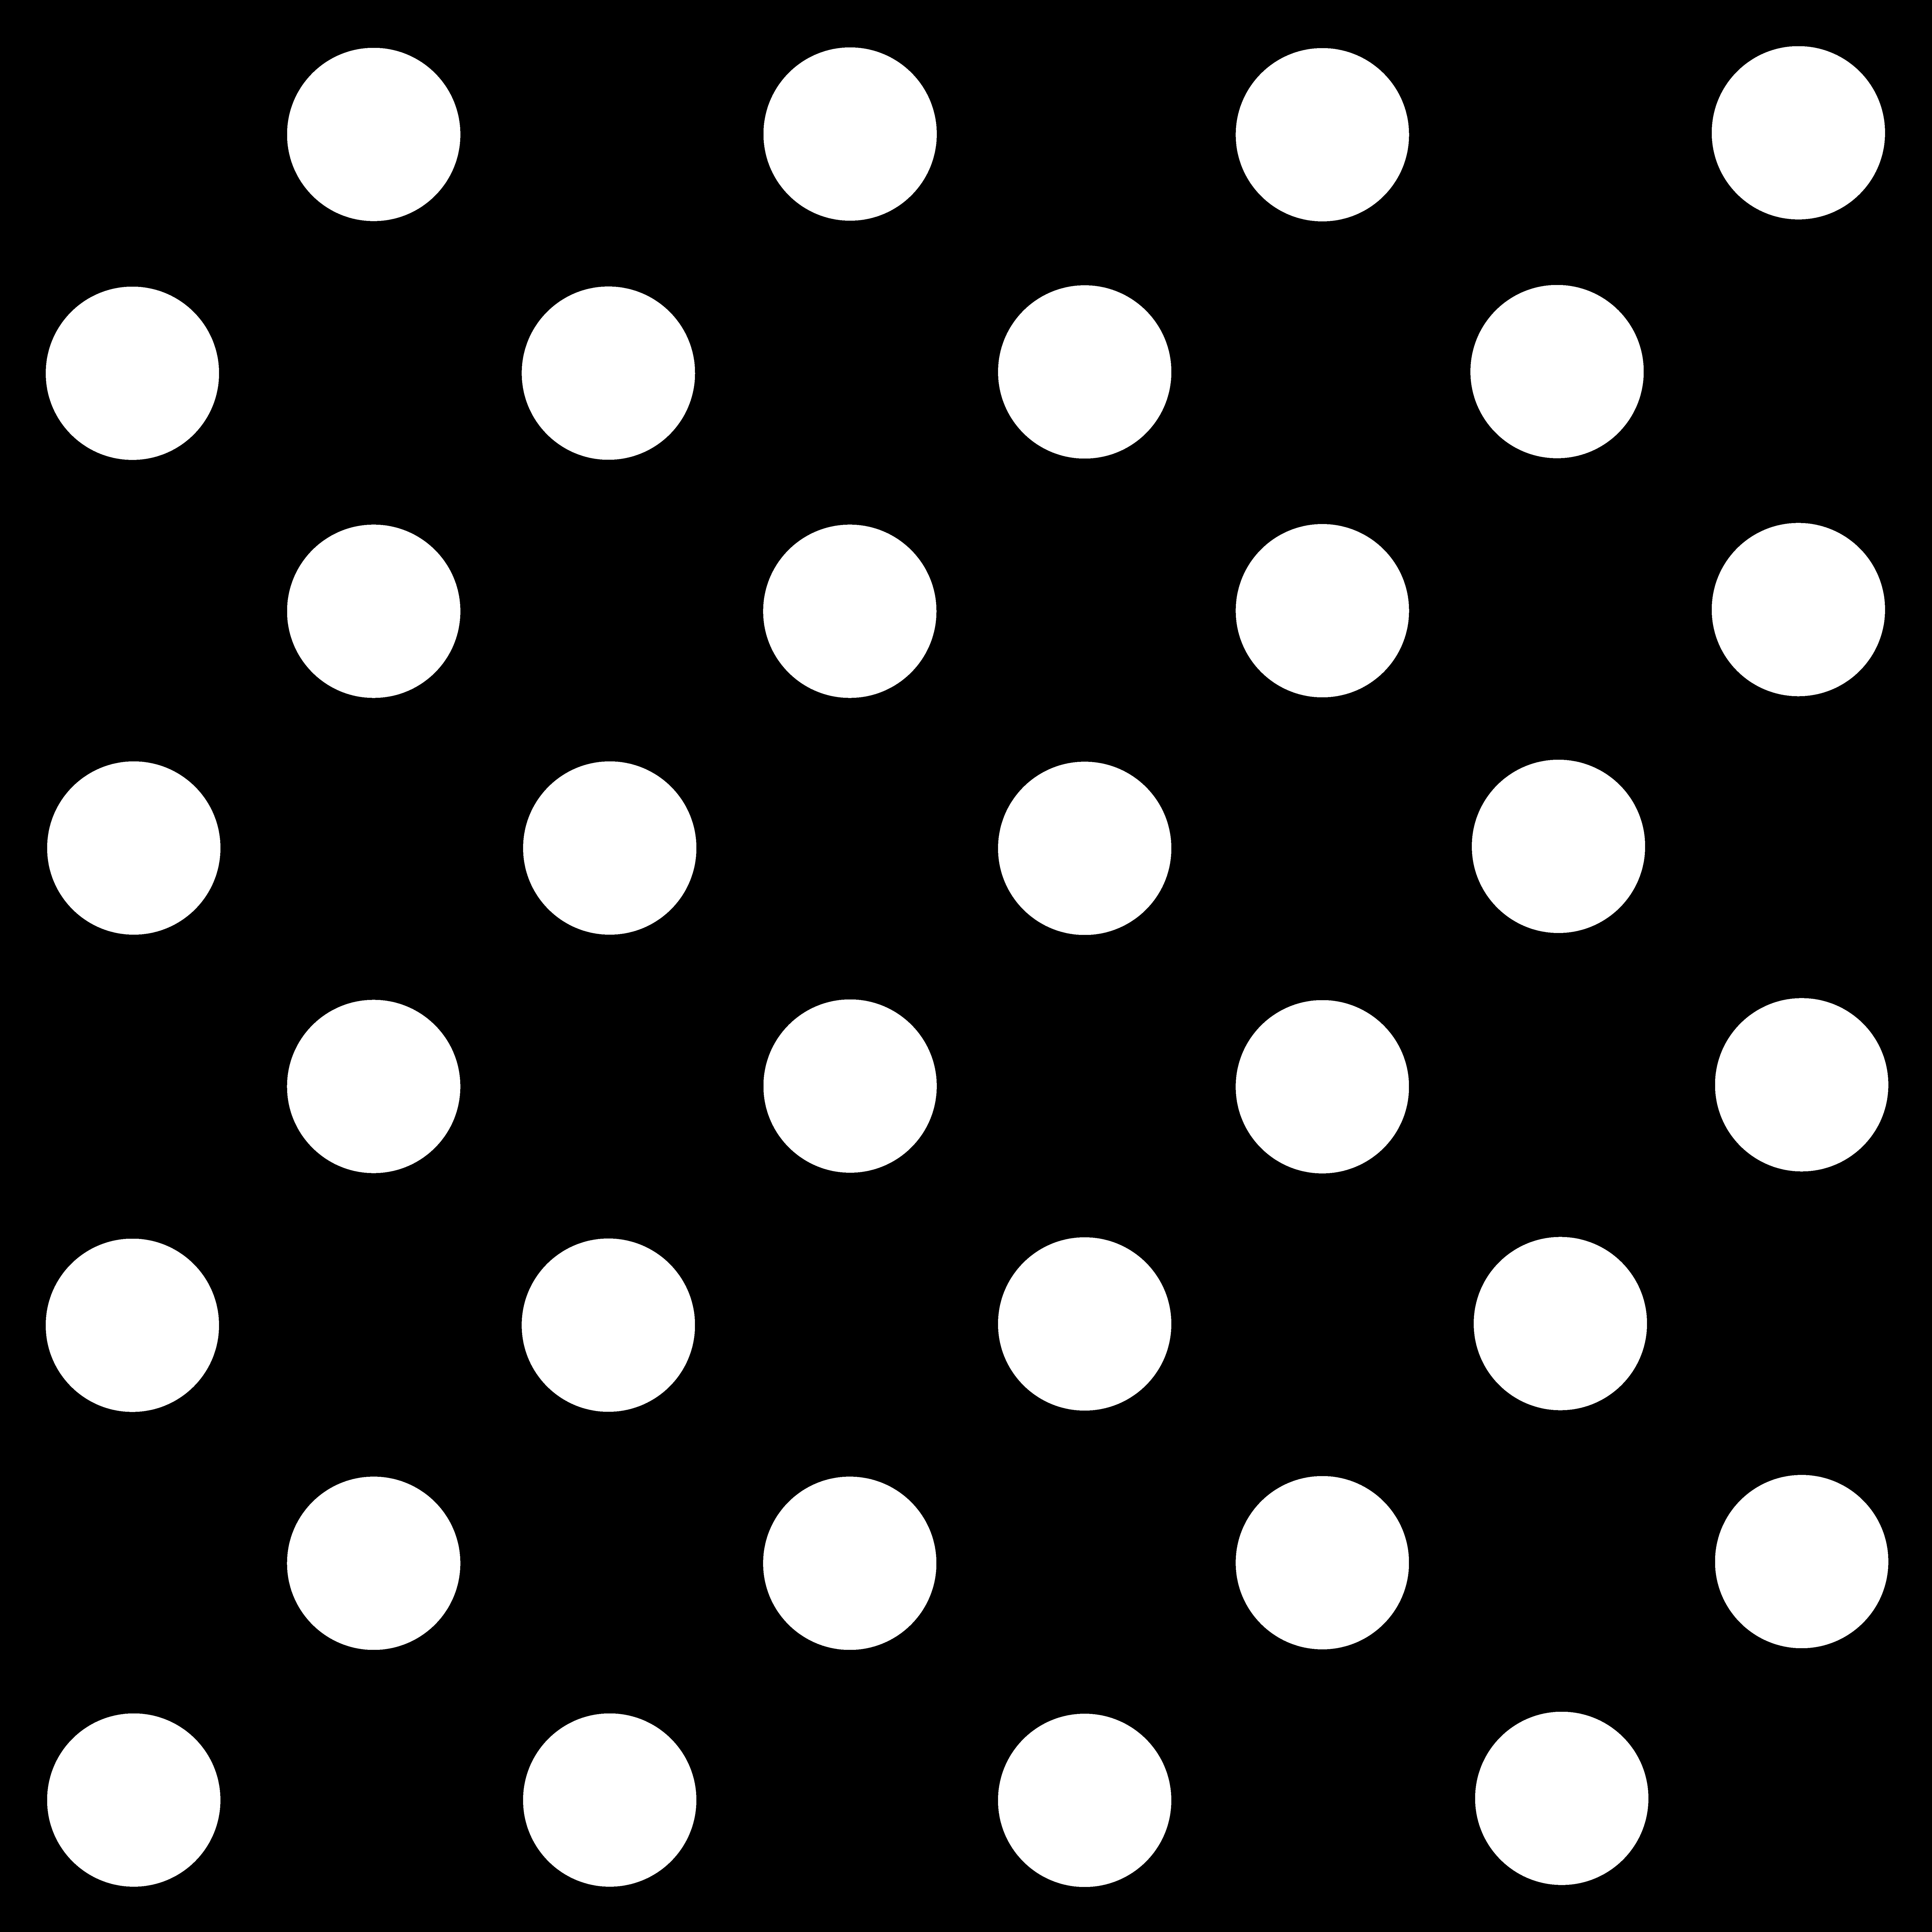 White Polka Dots on Black Background.